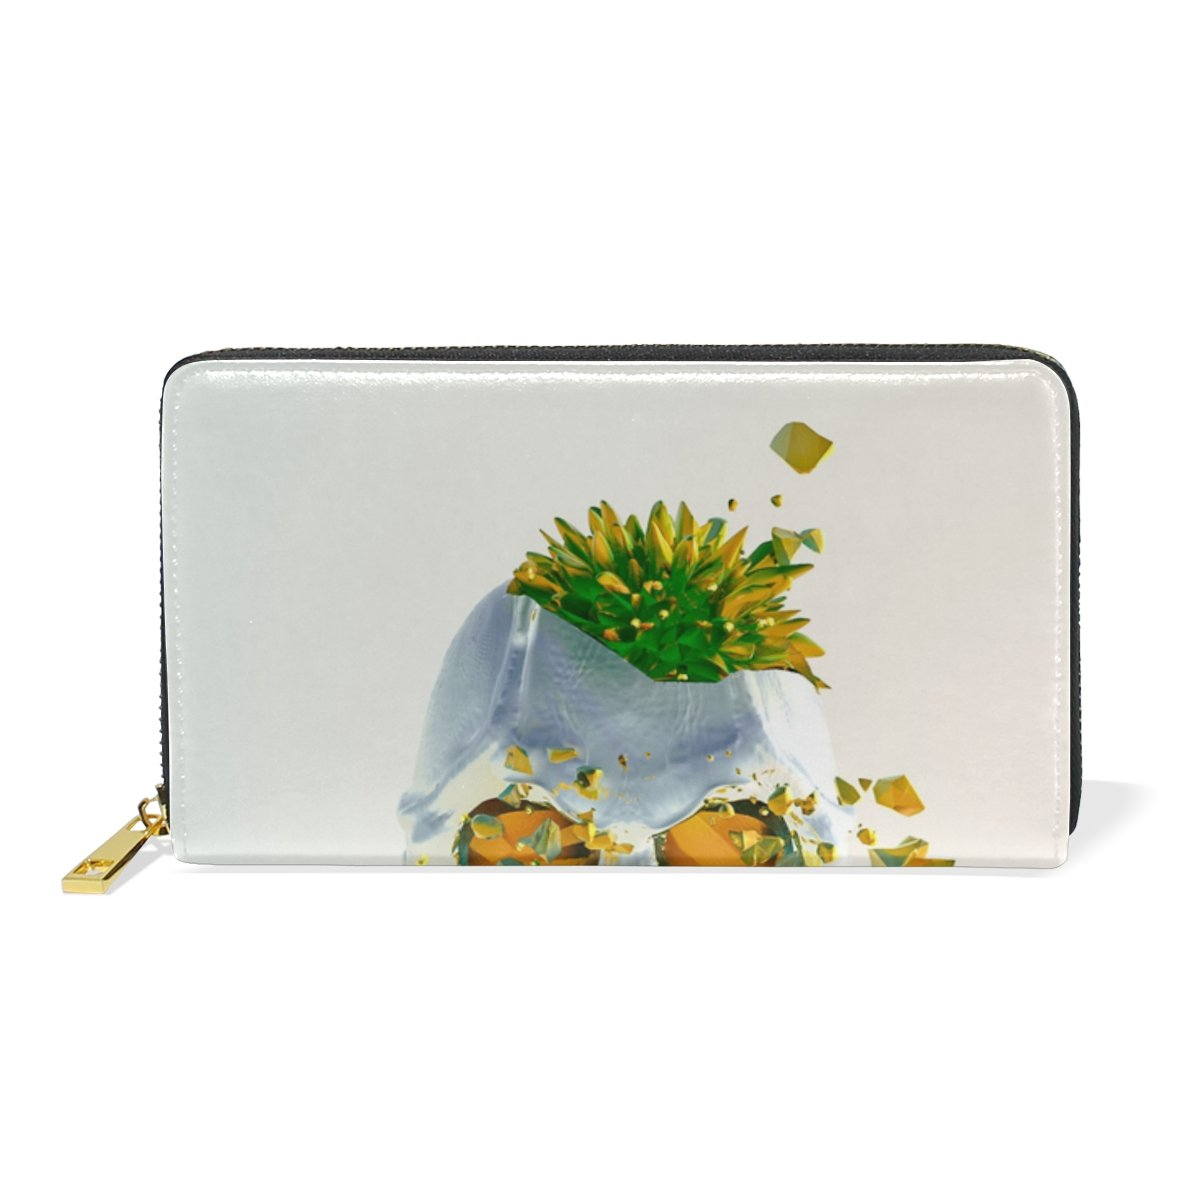 5d8fd7e859b1 POUKE Pineapple Skull Leather Women's Wallet Card Case Organizer ...